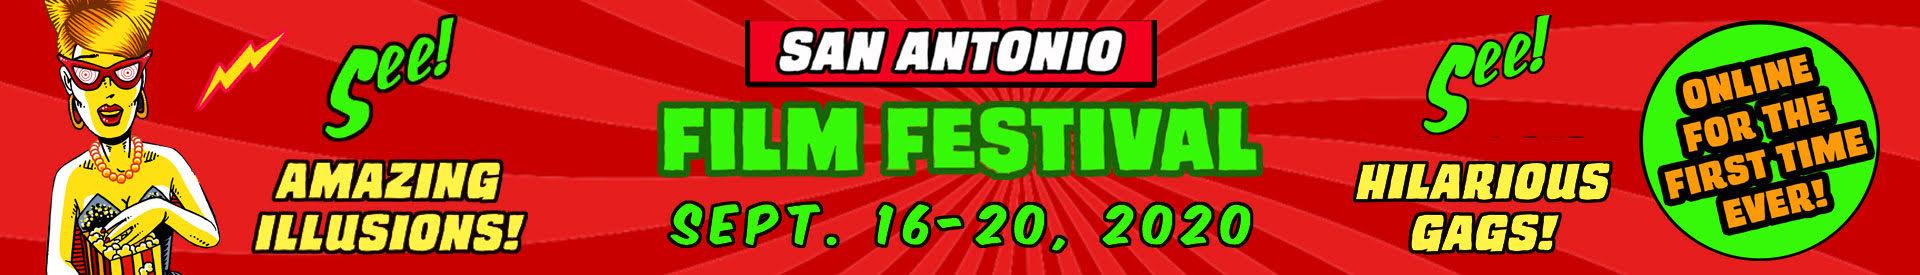 26th San Antonio Film Festival Sept 16-20